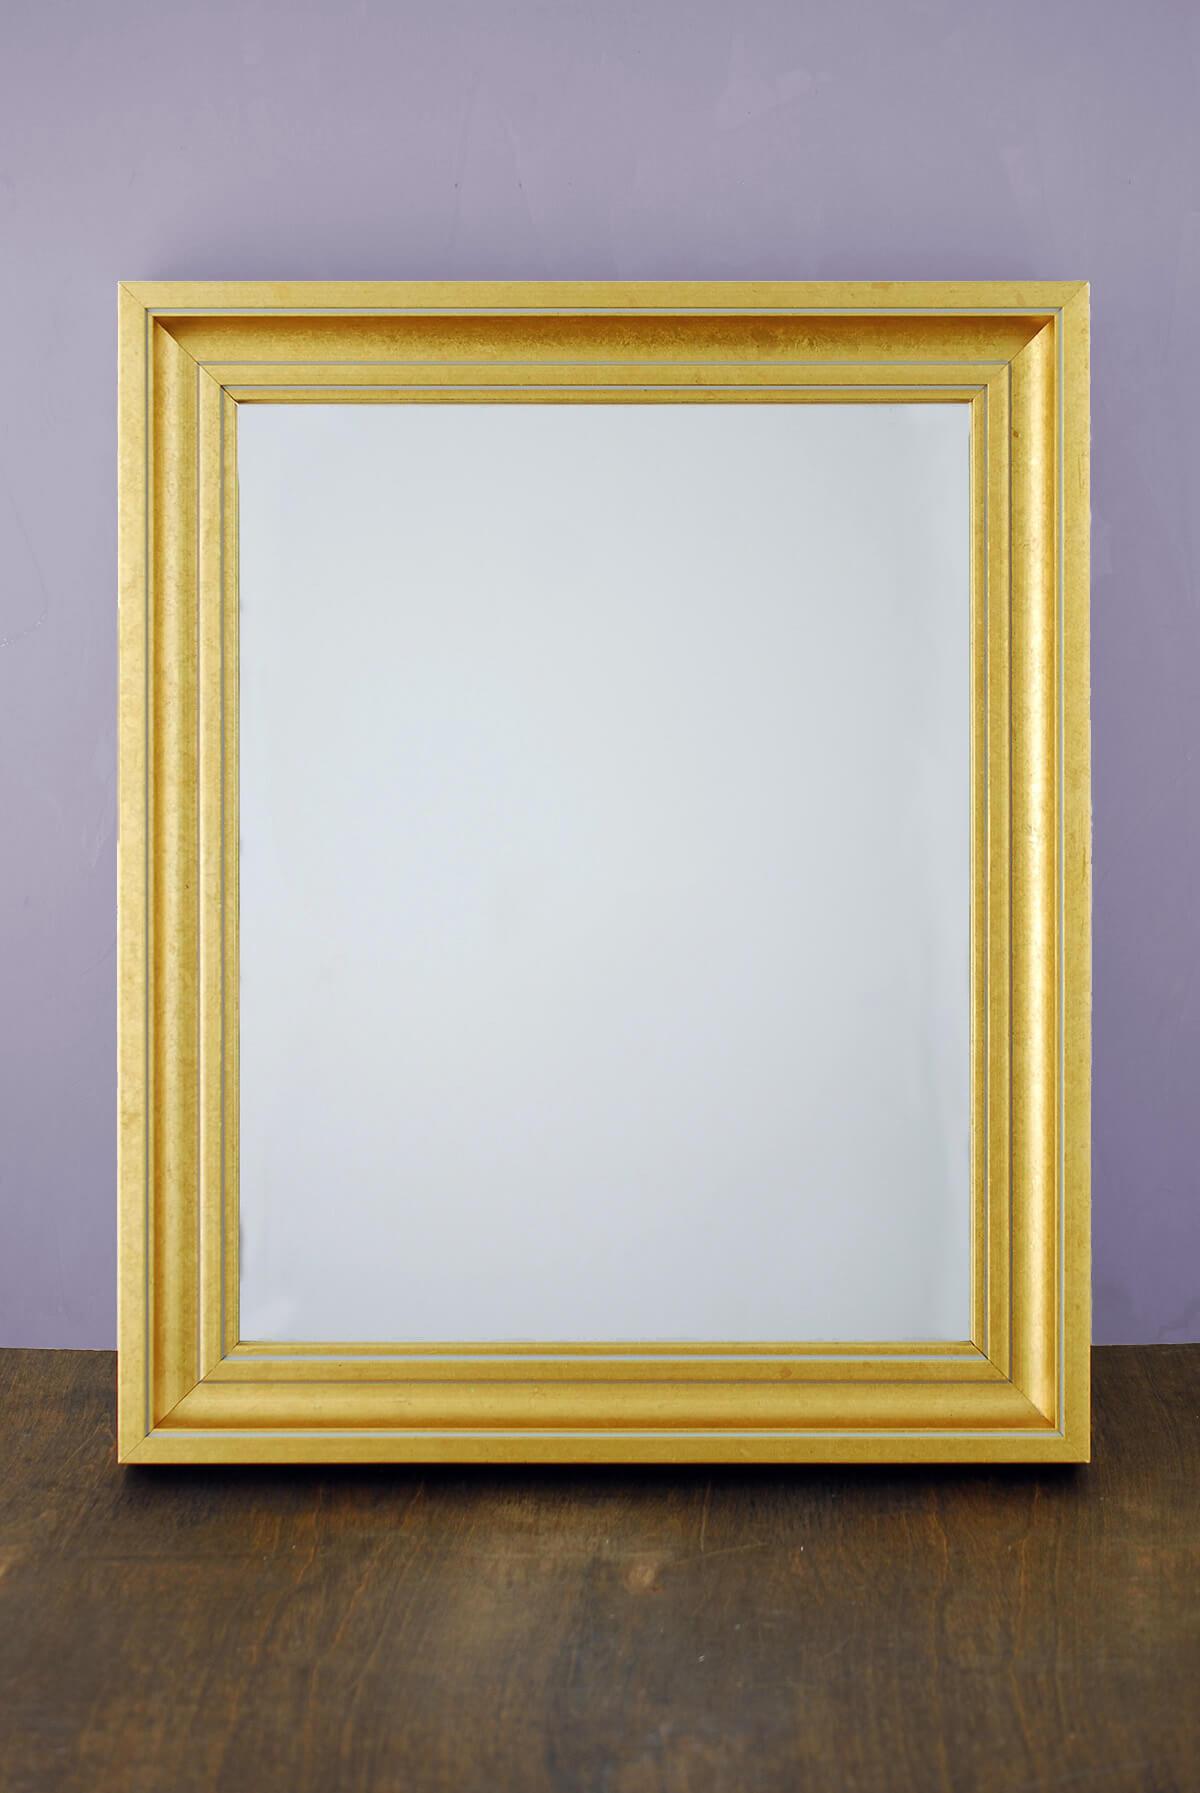 Framed Mirror Gold 11x14